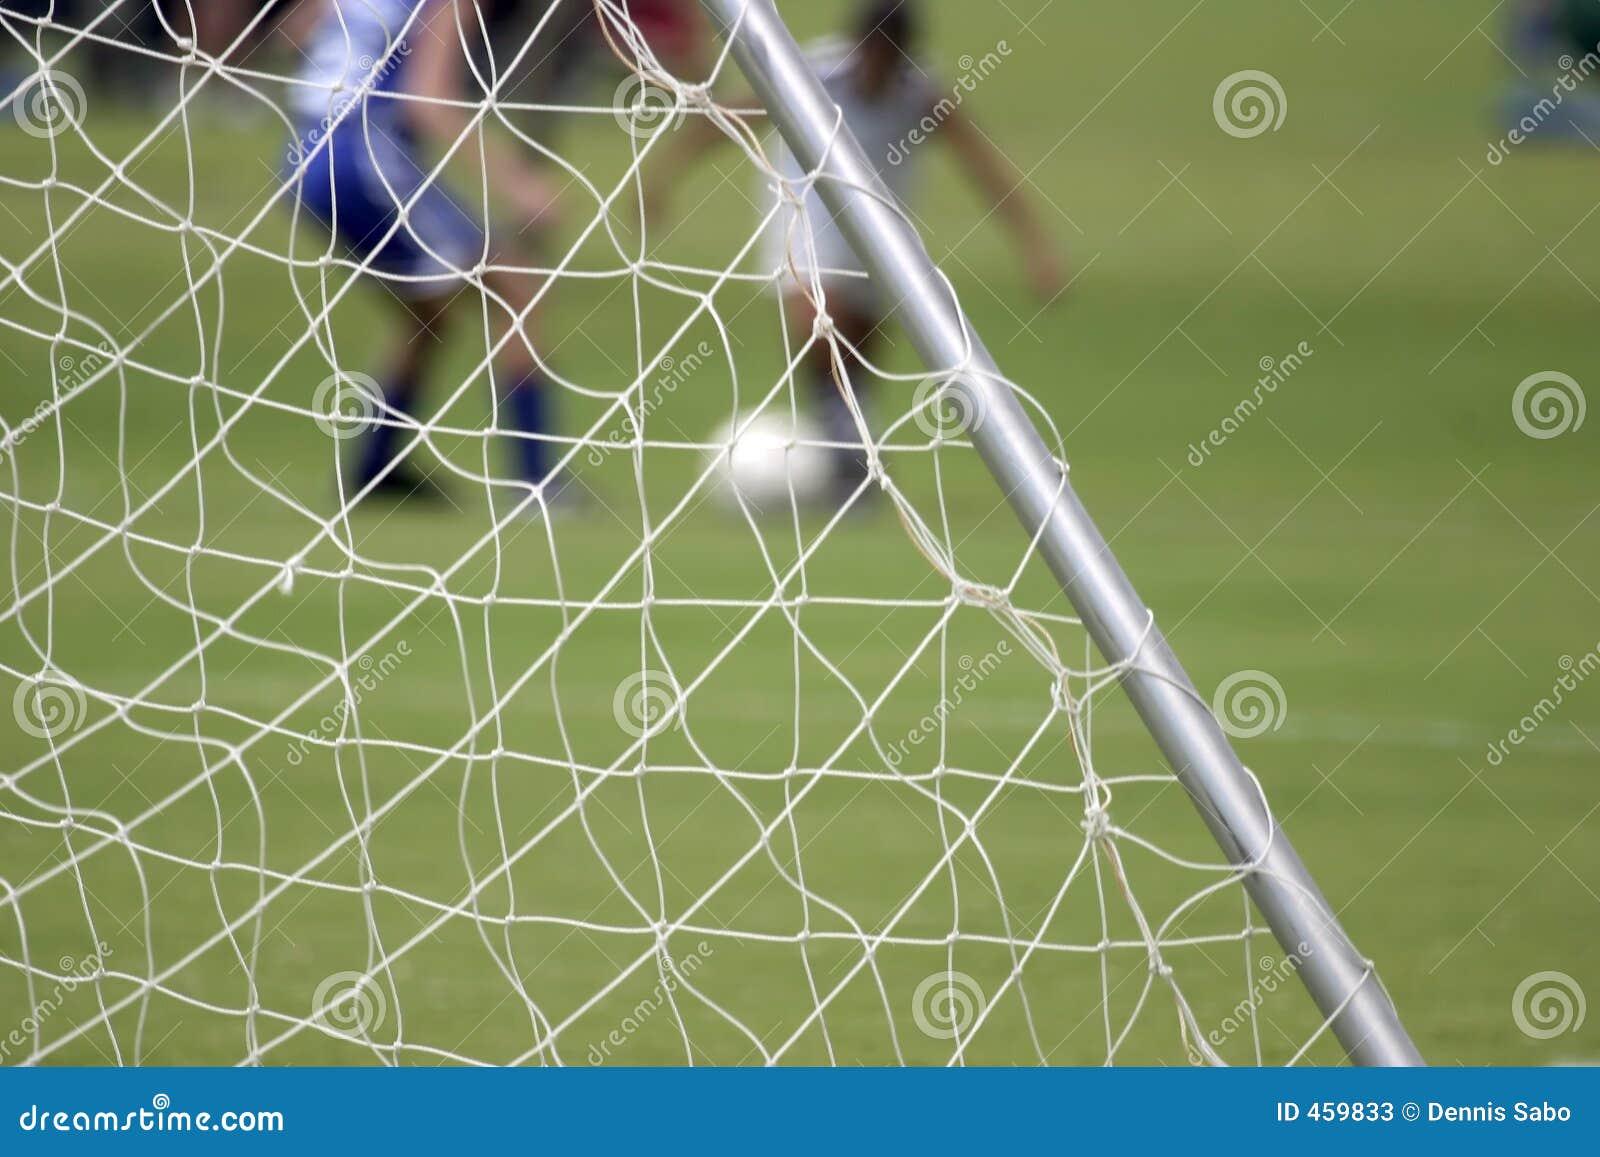 сетчатый футбол